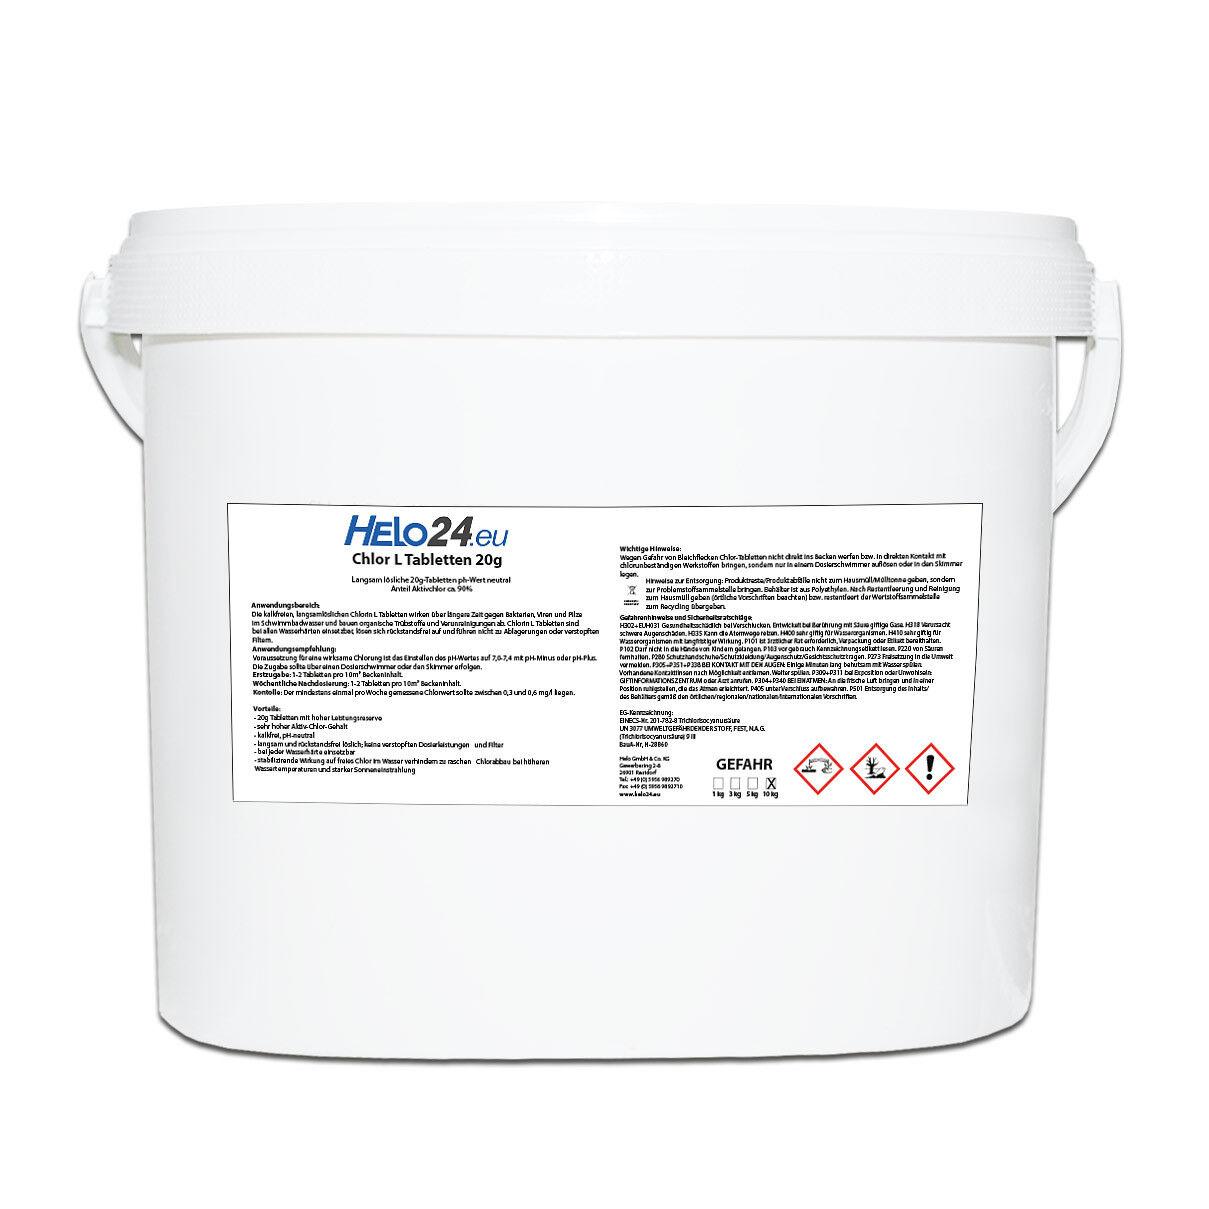 10kg Eimer Chlortabletten mit 90% Aktivchlor Chlor L, 20g Tabletten